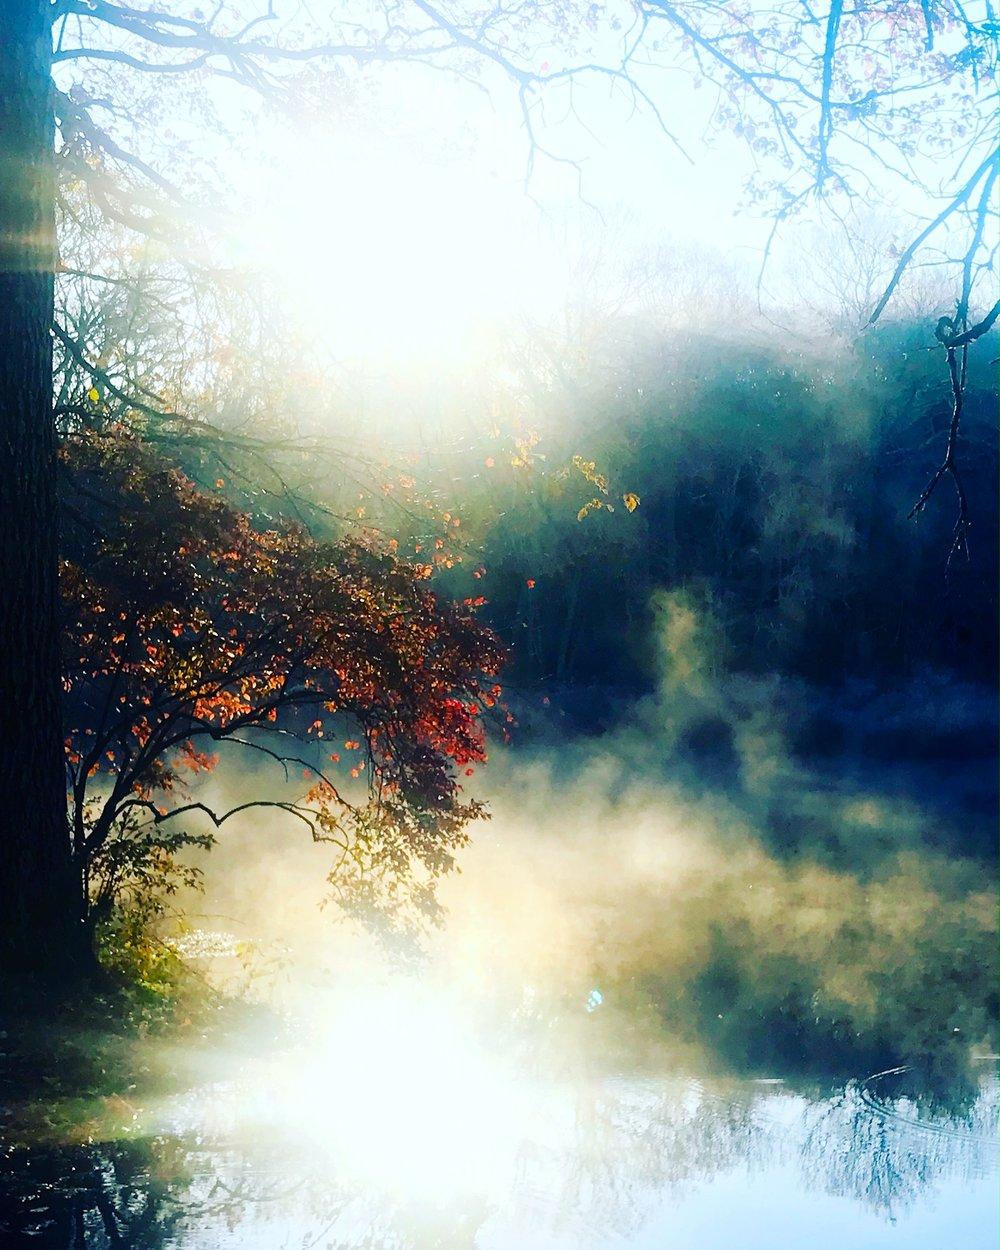 mystic river halloween 2018.JPG